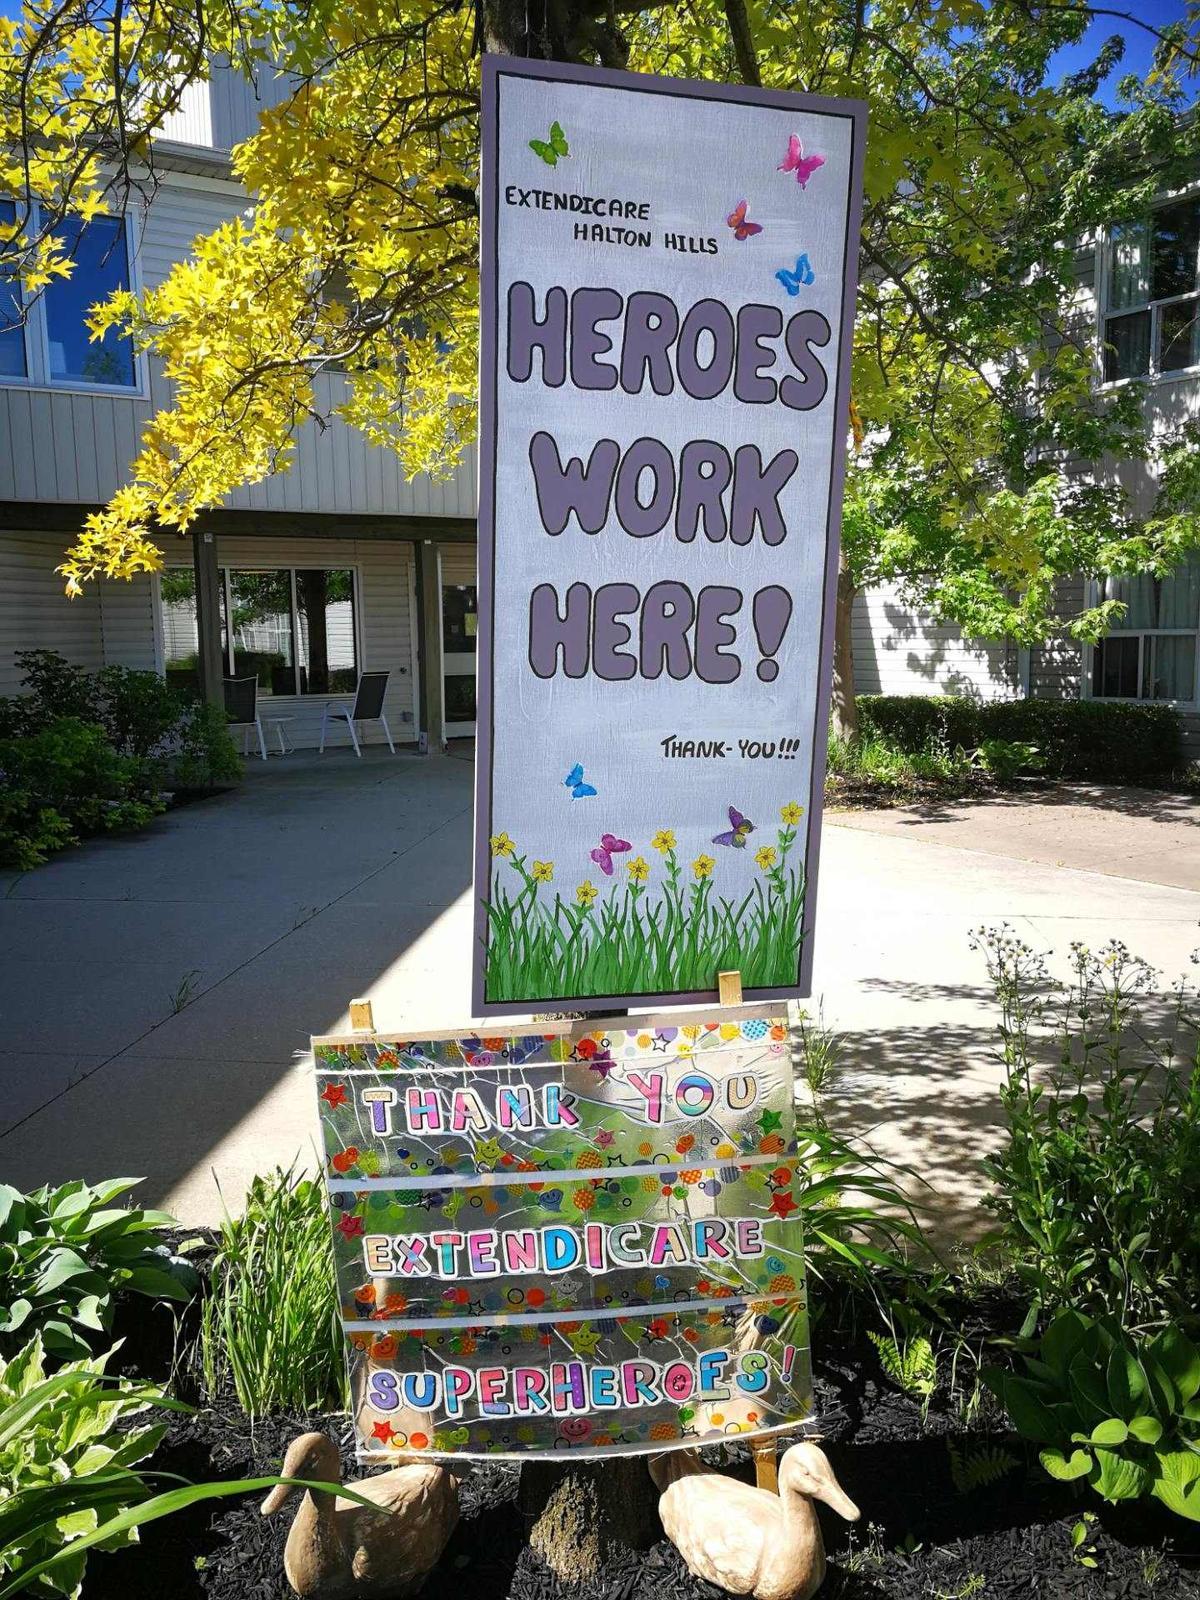 Extendicare Halton Hills COVID Heroes